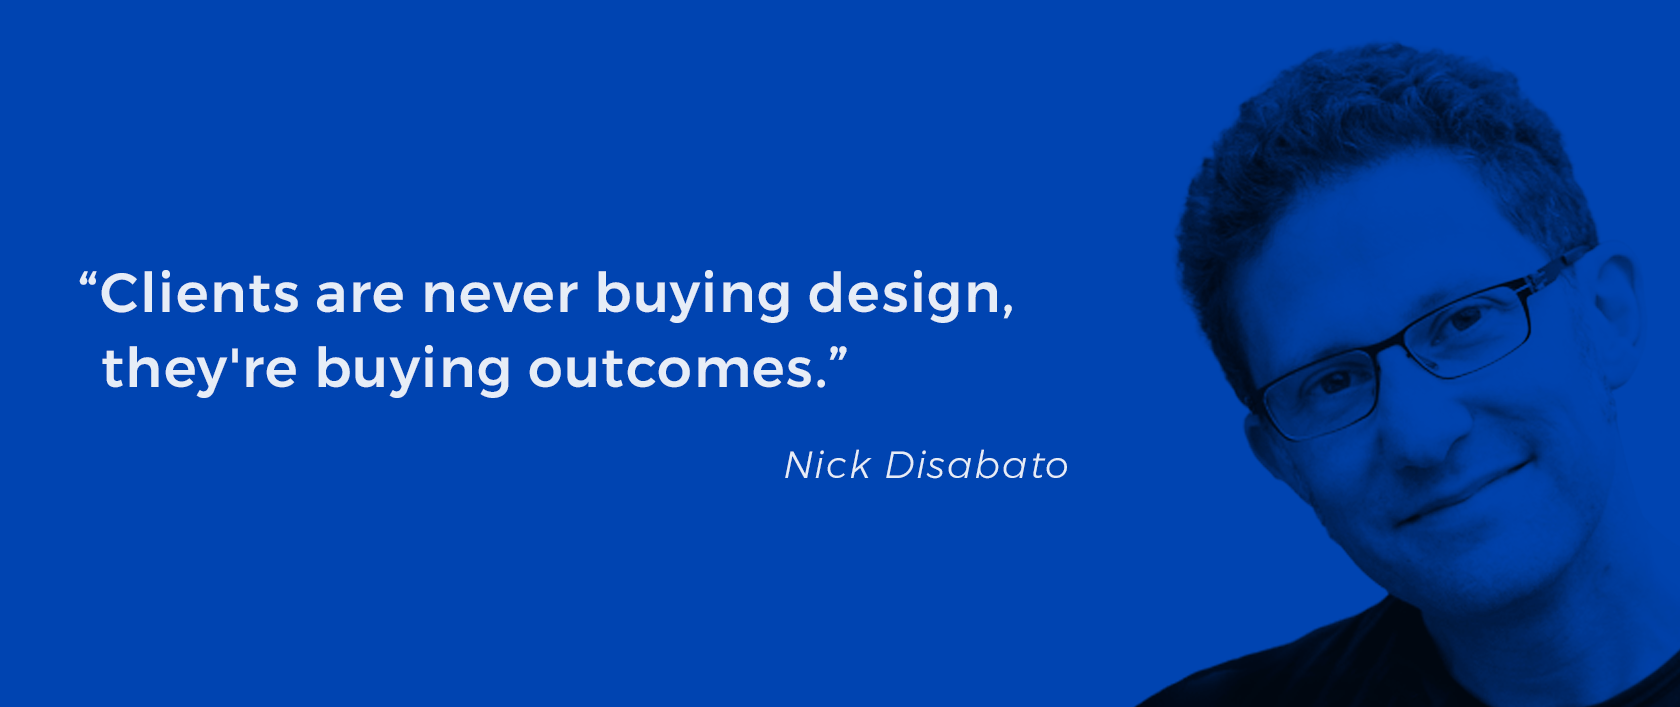 Business value of design.